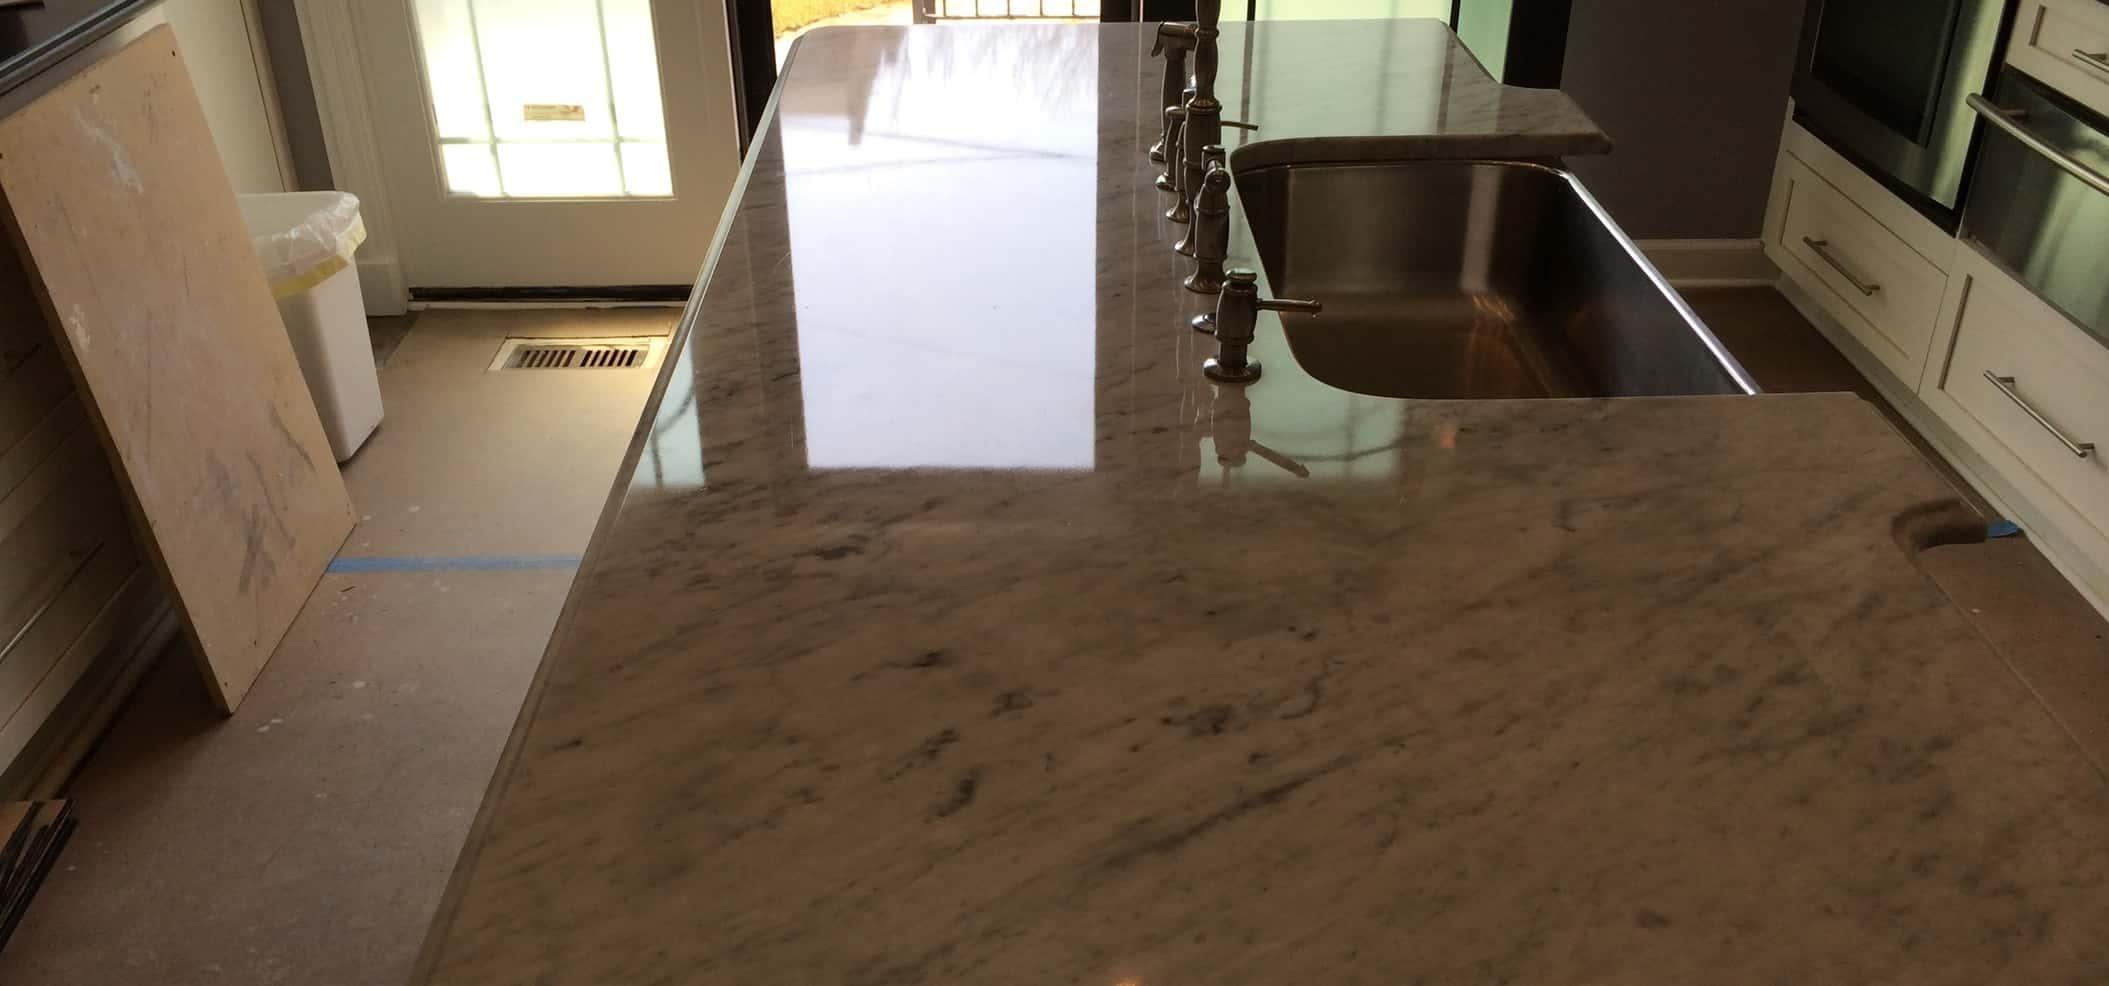 Granite Heroes Marble Polishing Chicago Il Stone